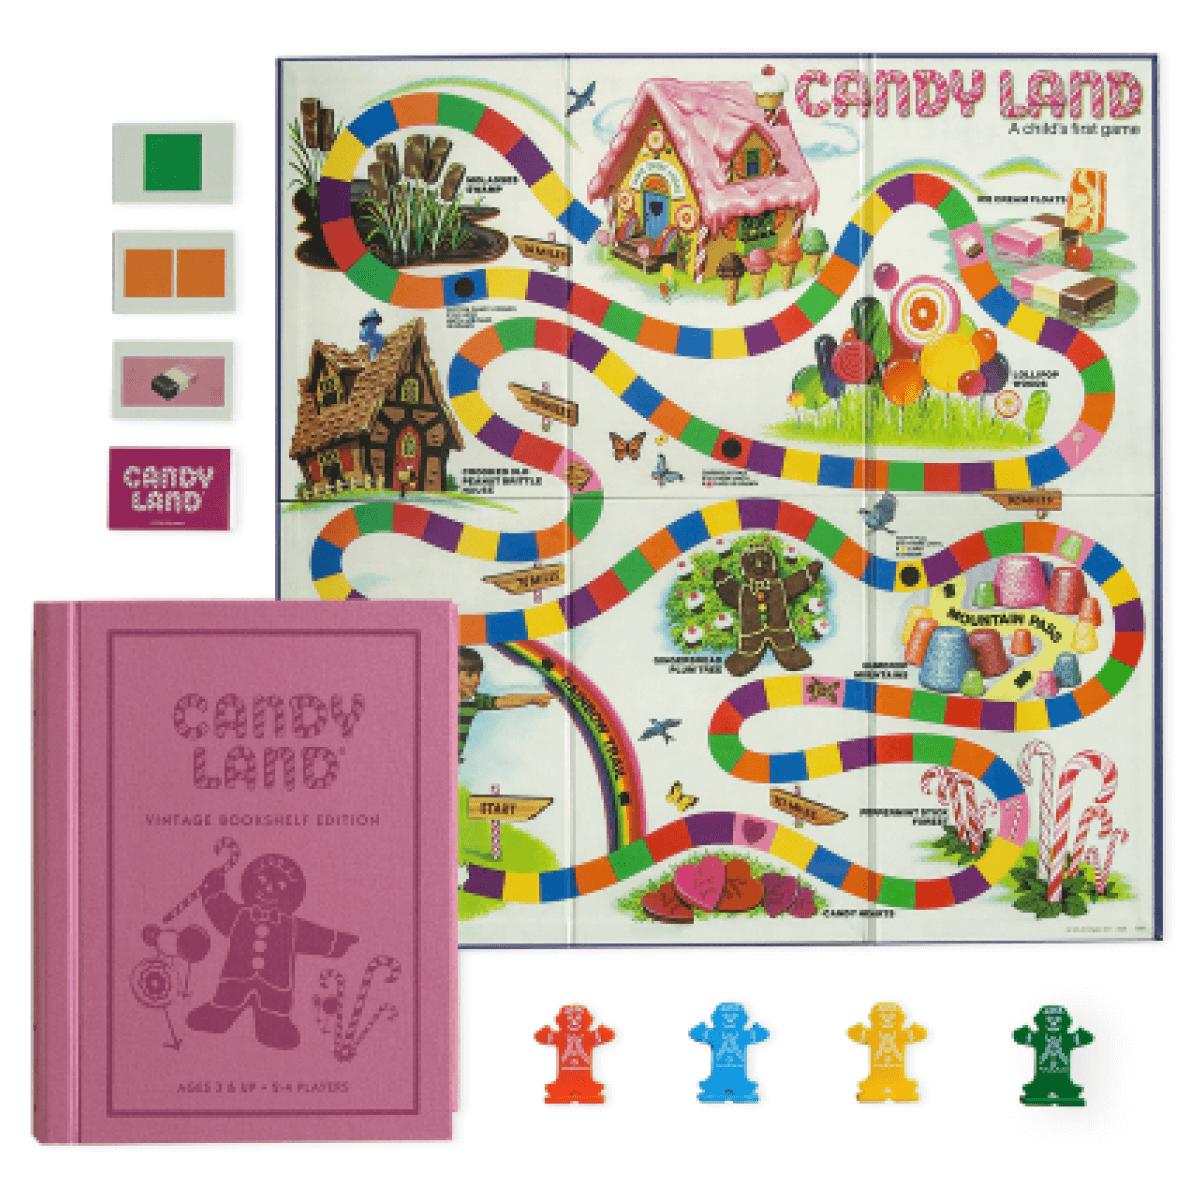 CANDY LAND VINTAGE BOOKSHELF EDITION